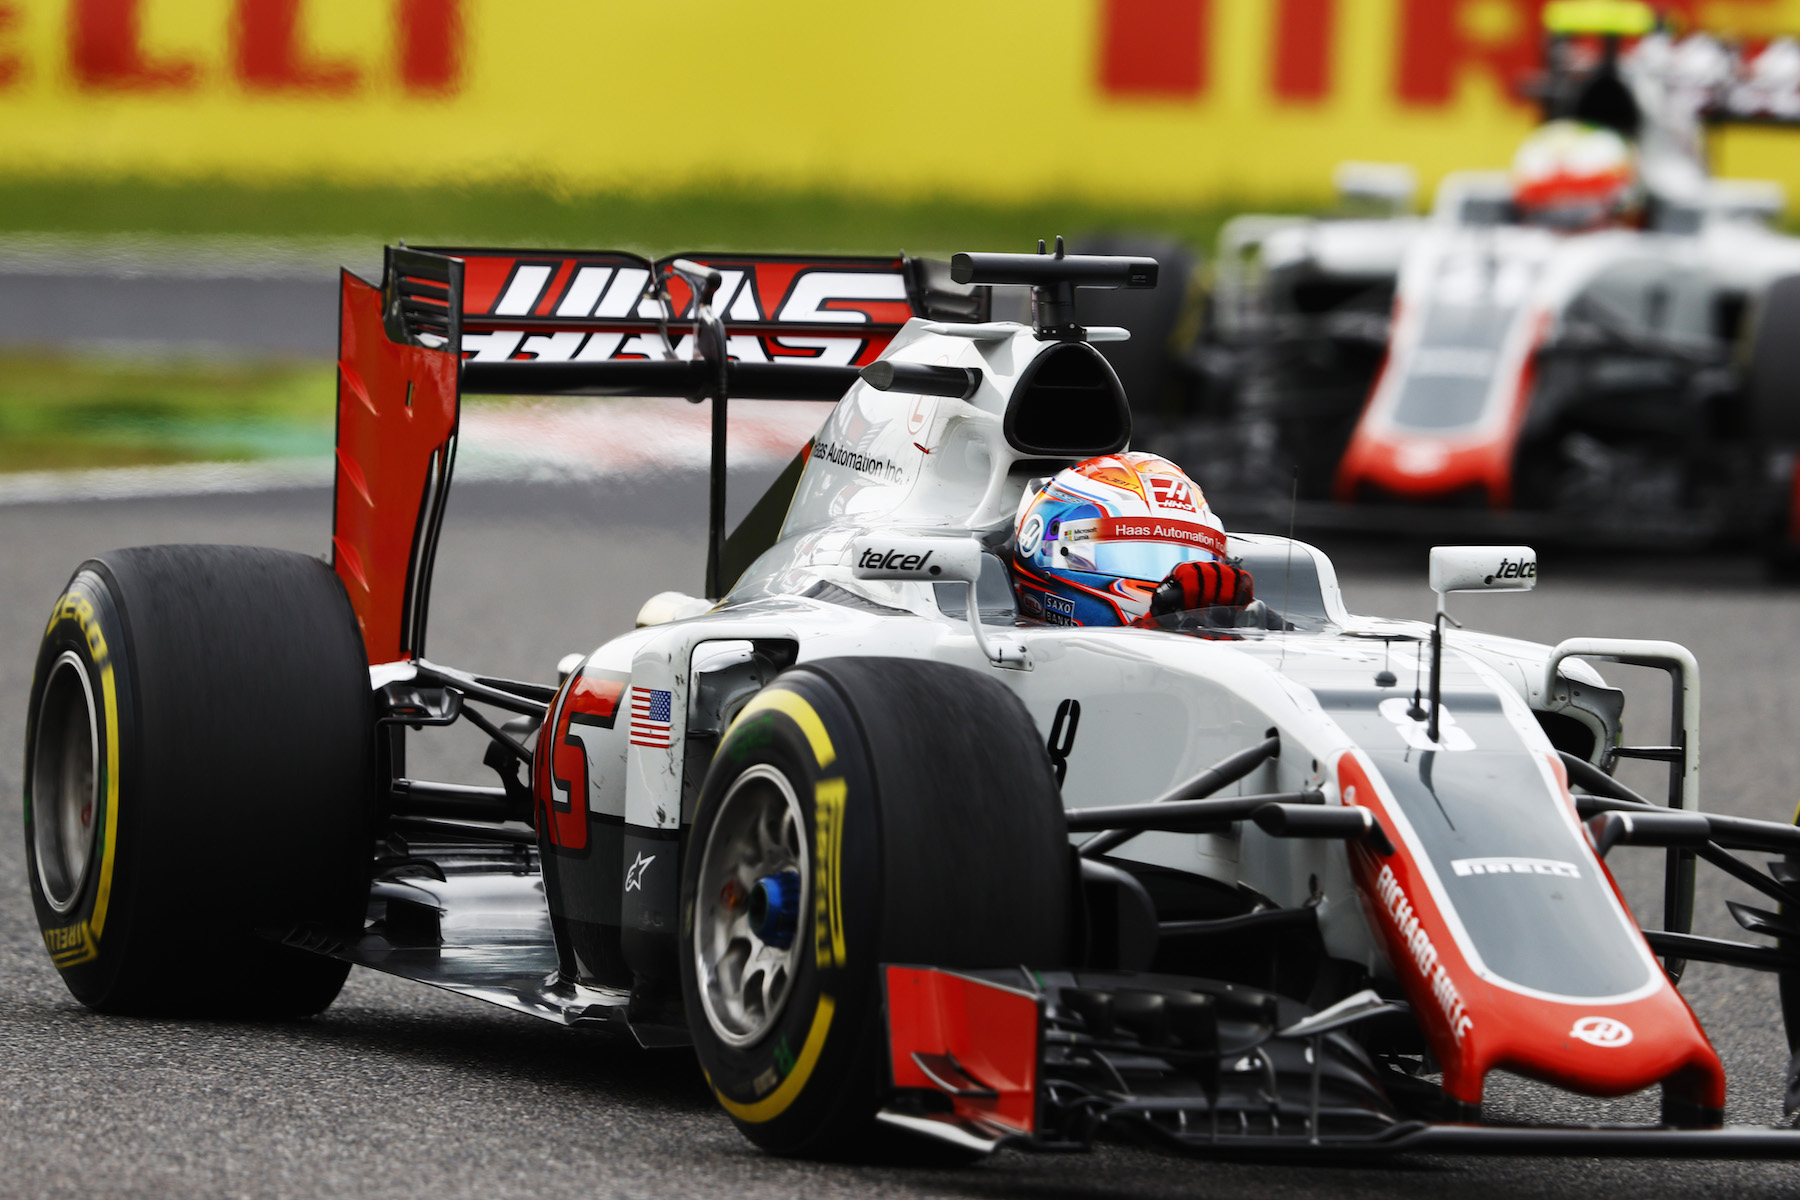 Salracing - Haas F1 Team